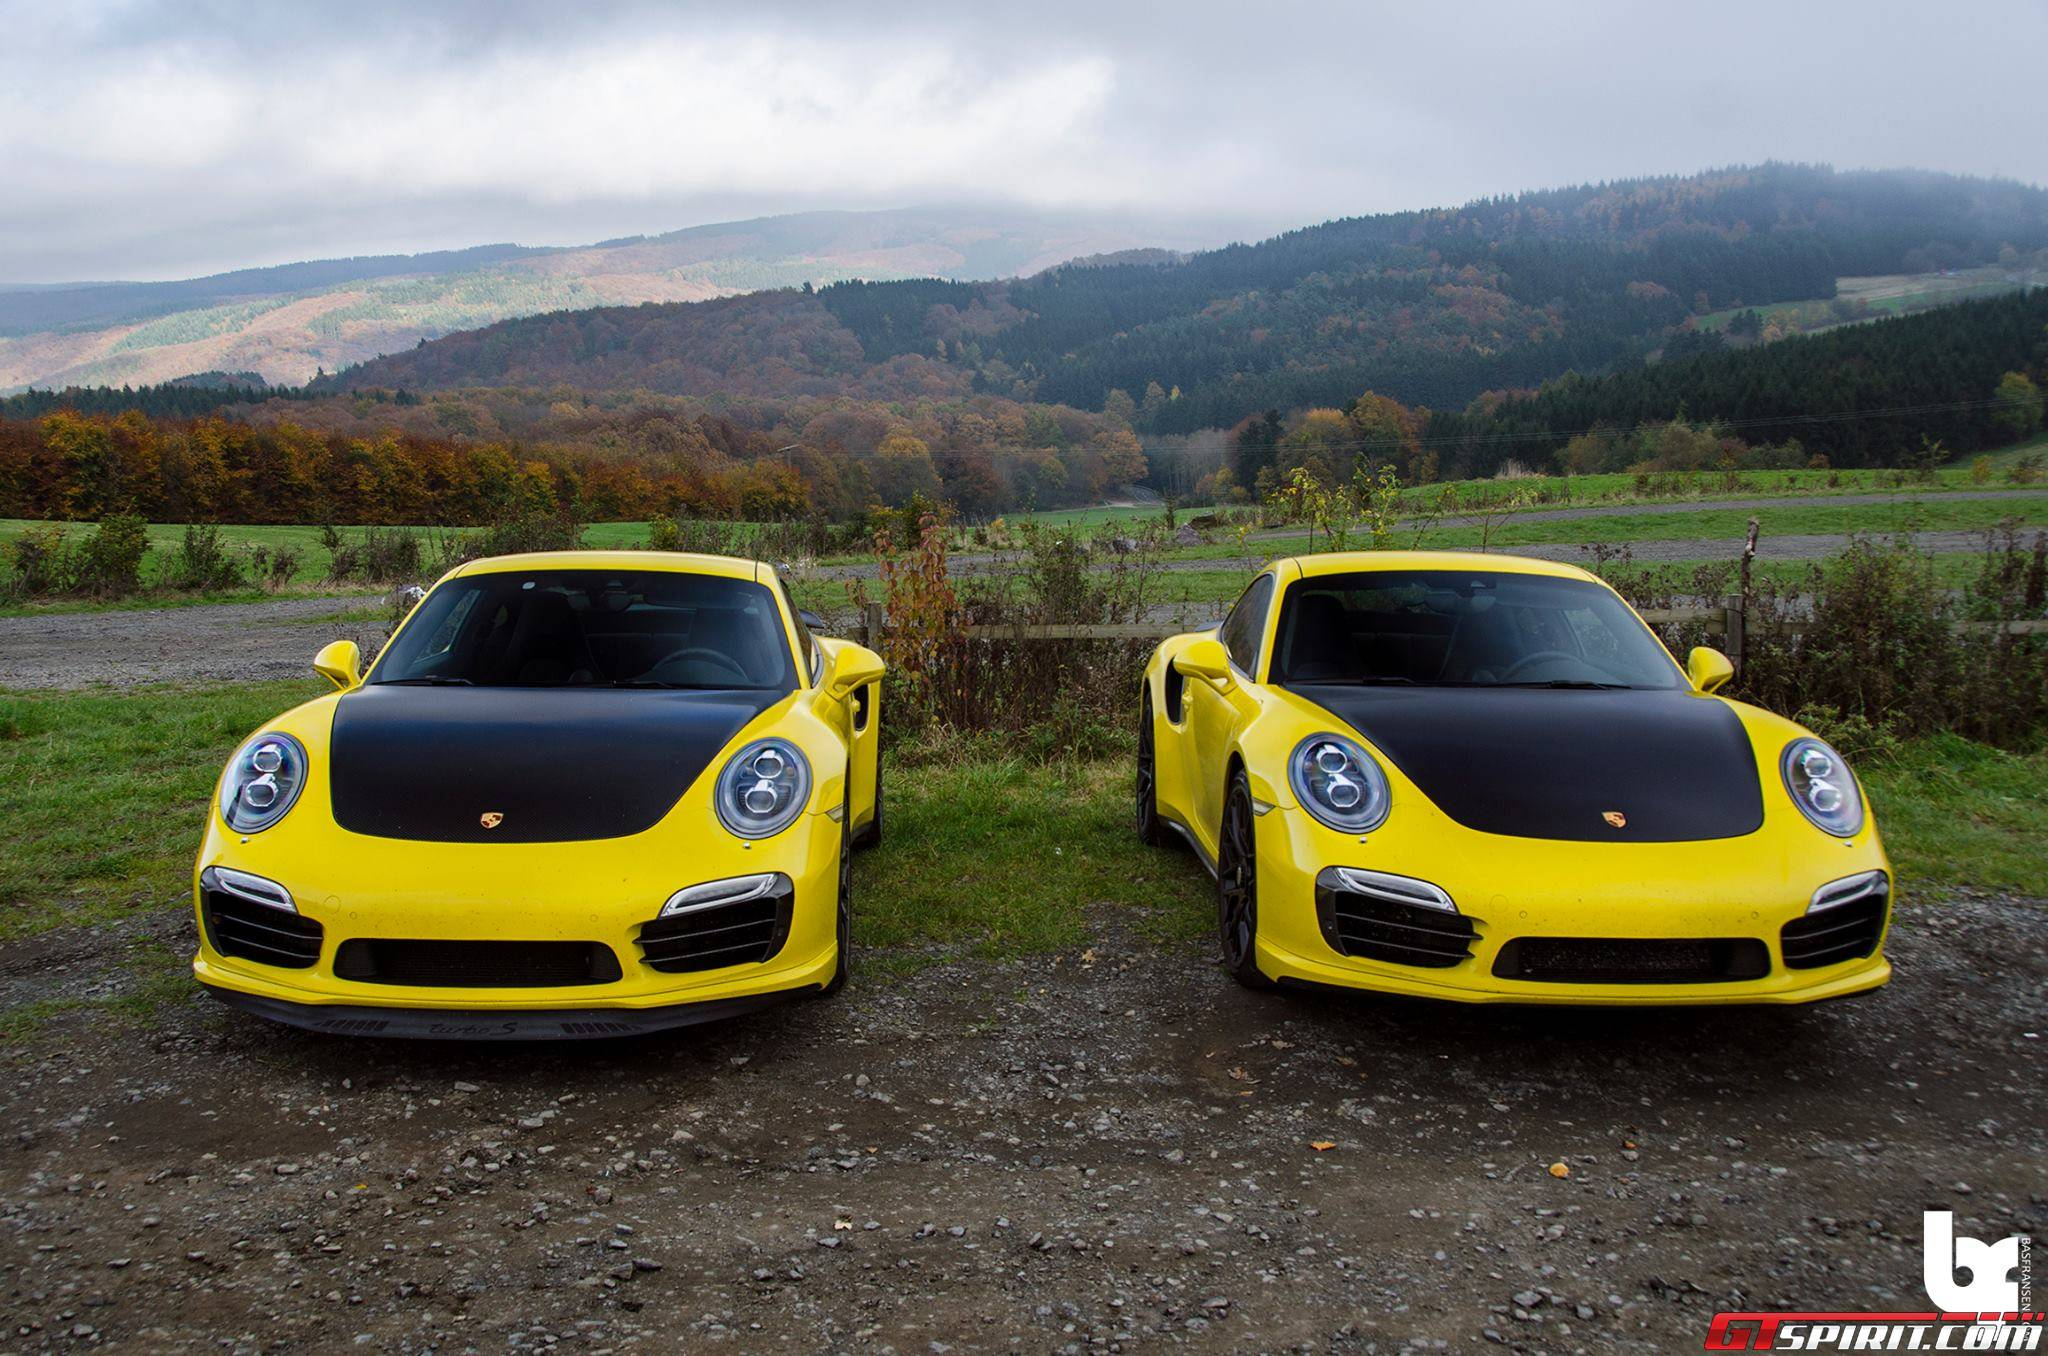 Photo Of The Day Double Yellow Porsche 911 Turbo S Gtspirit